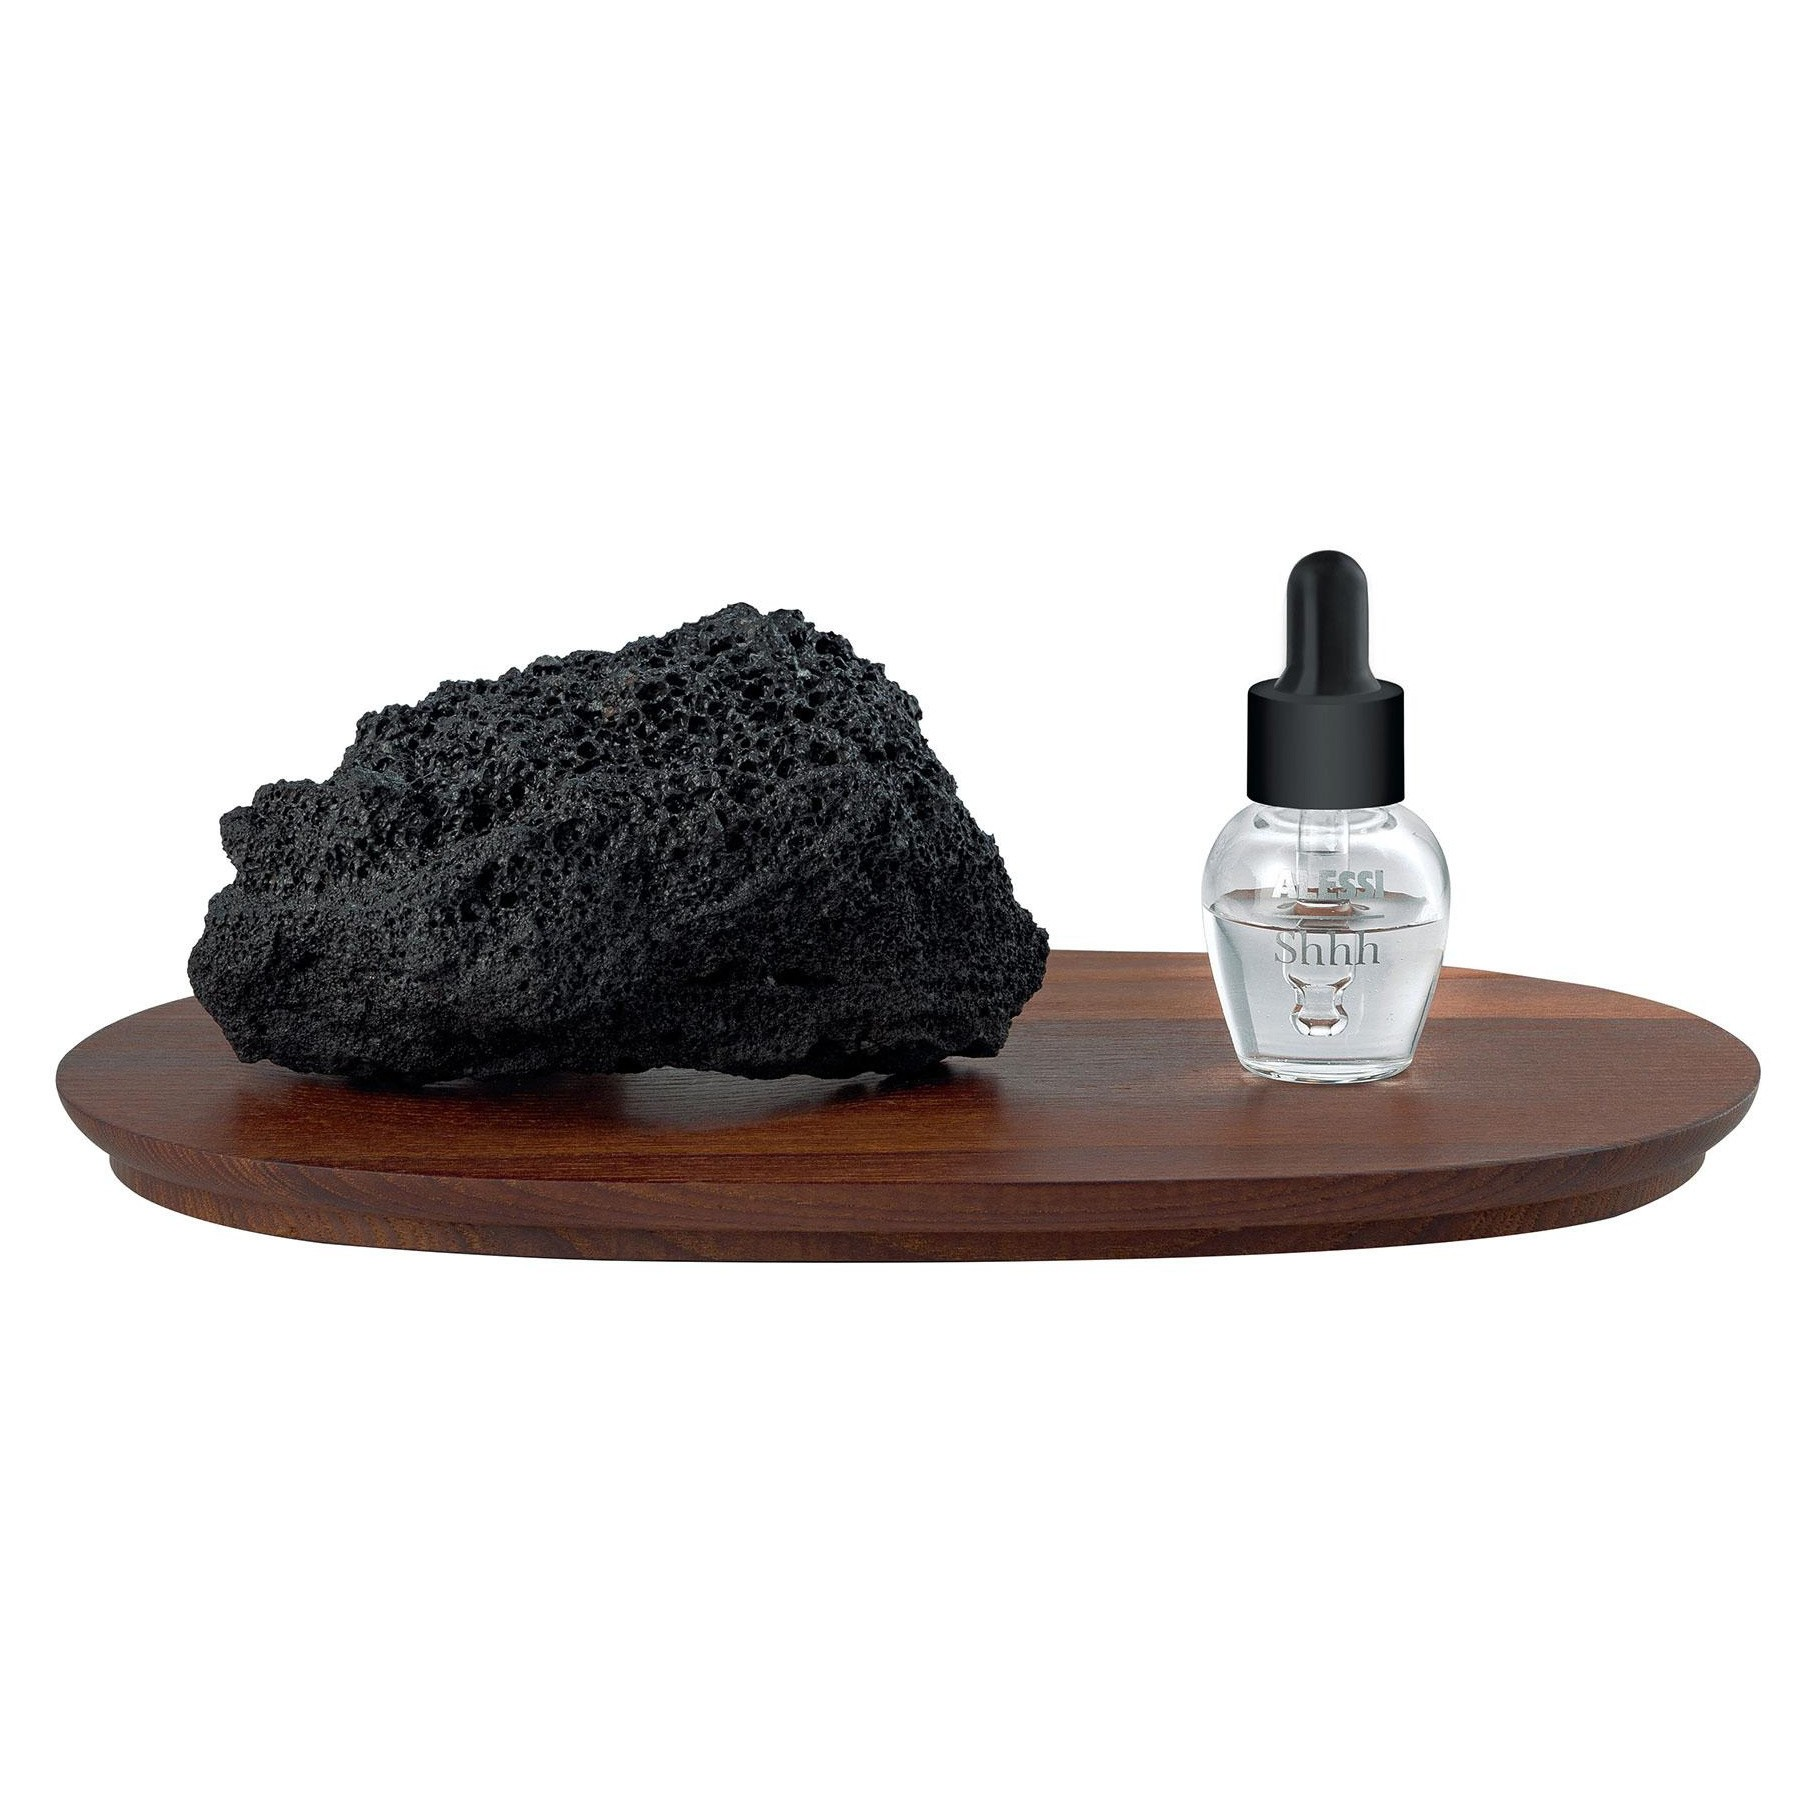 Alessi Shhh Fragrance Diffuser Made Of Lava Stone Ambientedirect